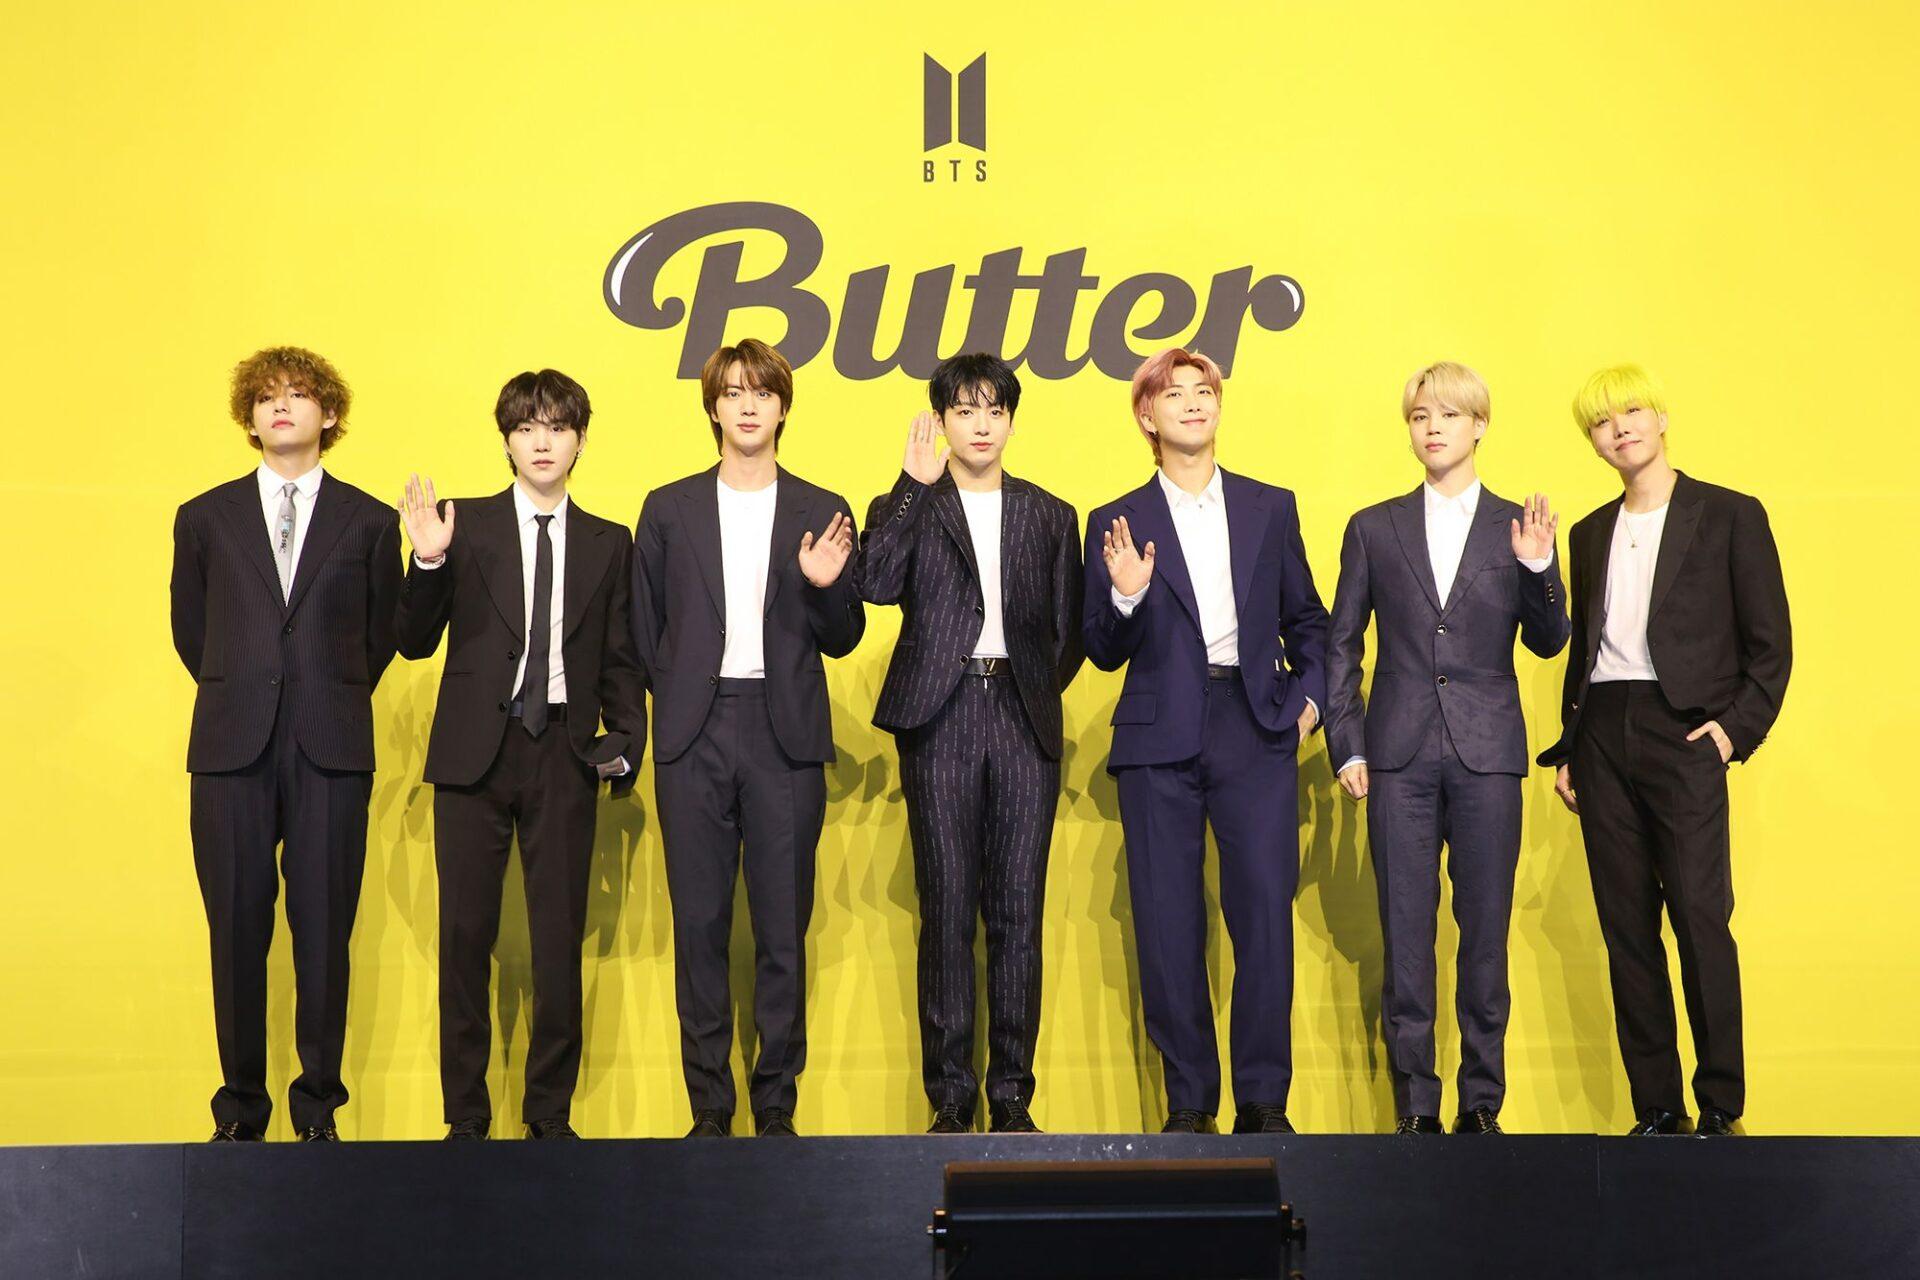 BTSメンバーの見分け方(Butter編)MVの登場順や衣装・髪型等で解説!